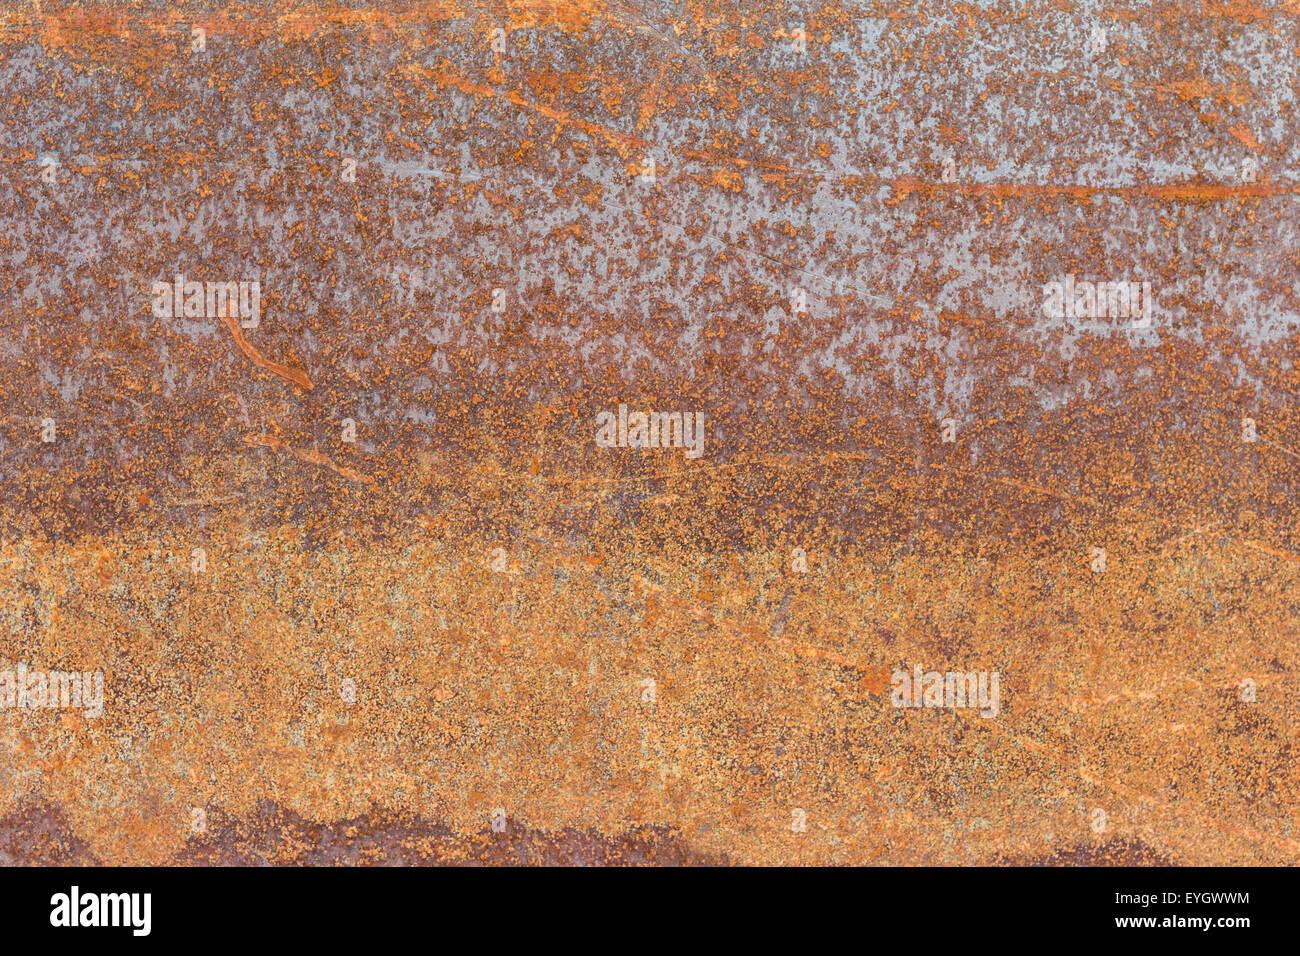 Old sheet metal plate full of rust - Stock Image